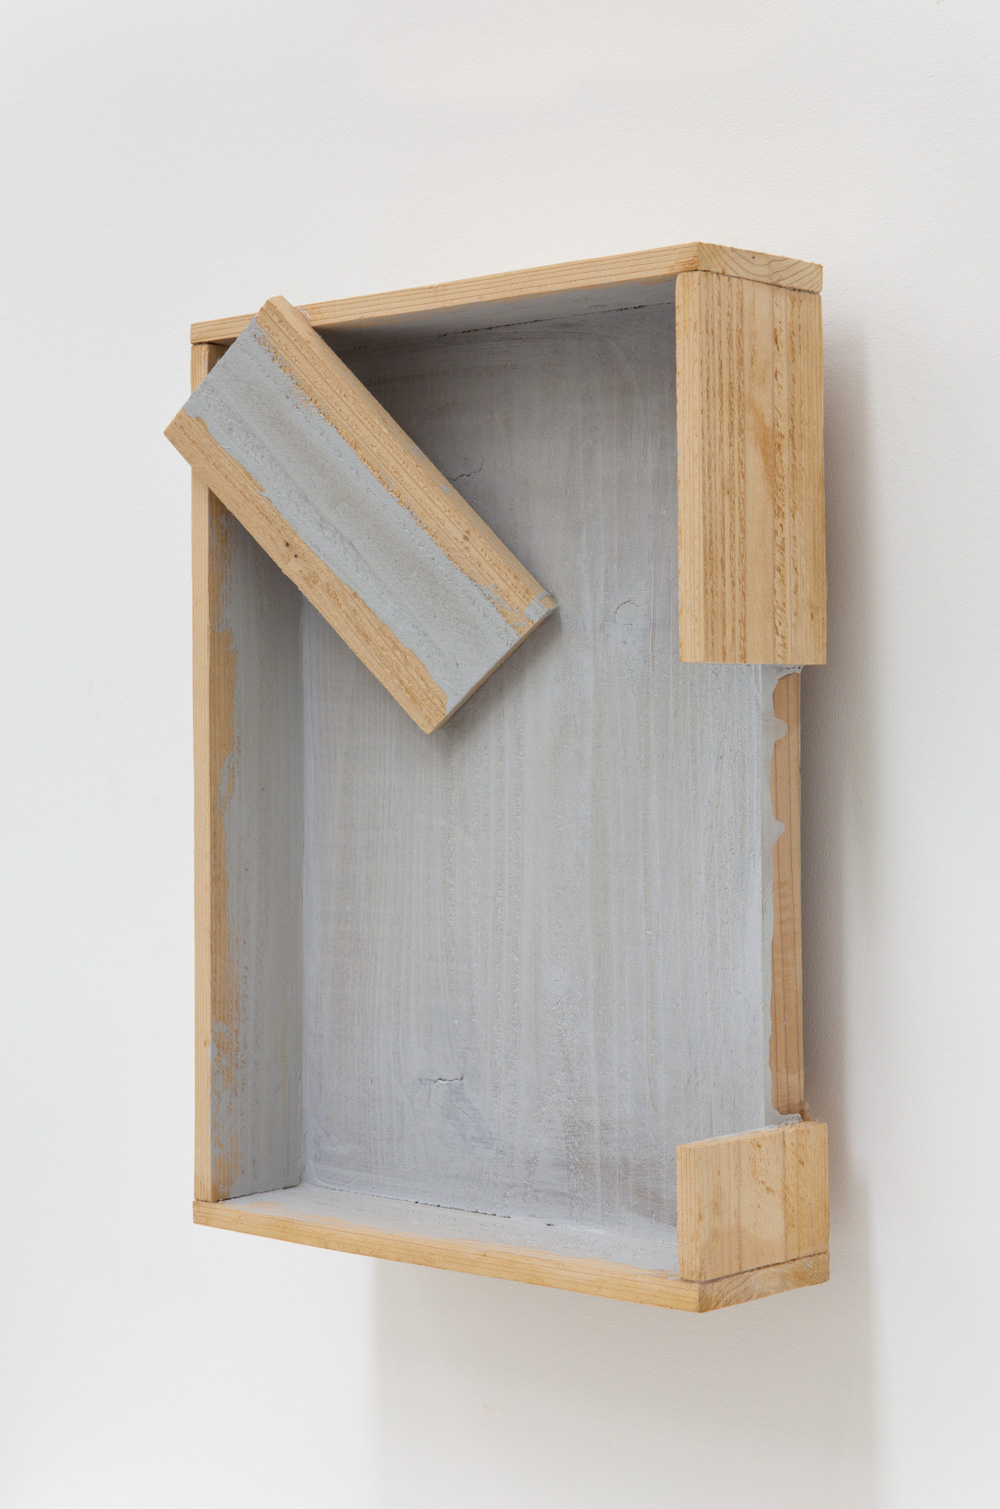 Channel , 2005 流水溝 ( Ryūsuikō ) Wood, acrylic 16 1/2 x 11 7/8 x 5 1/2 inches  42 x 30 x 14 cm